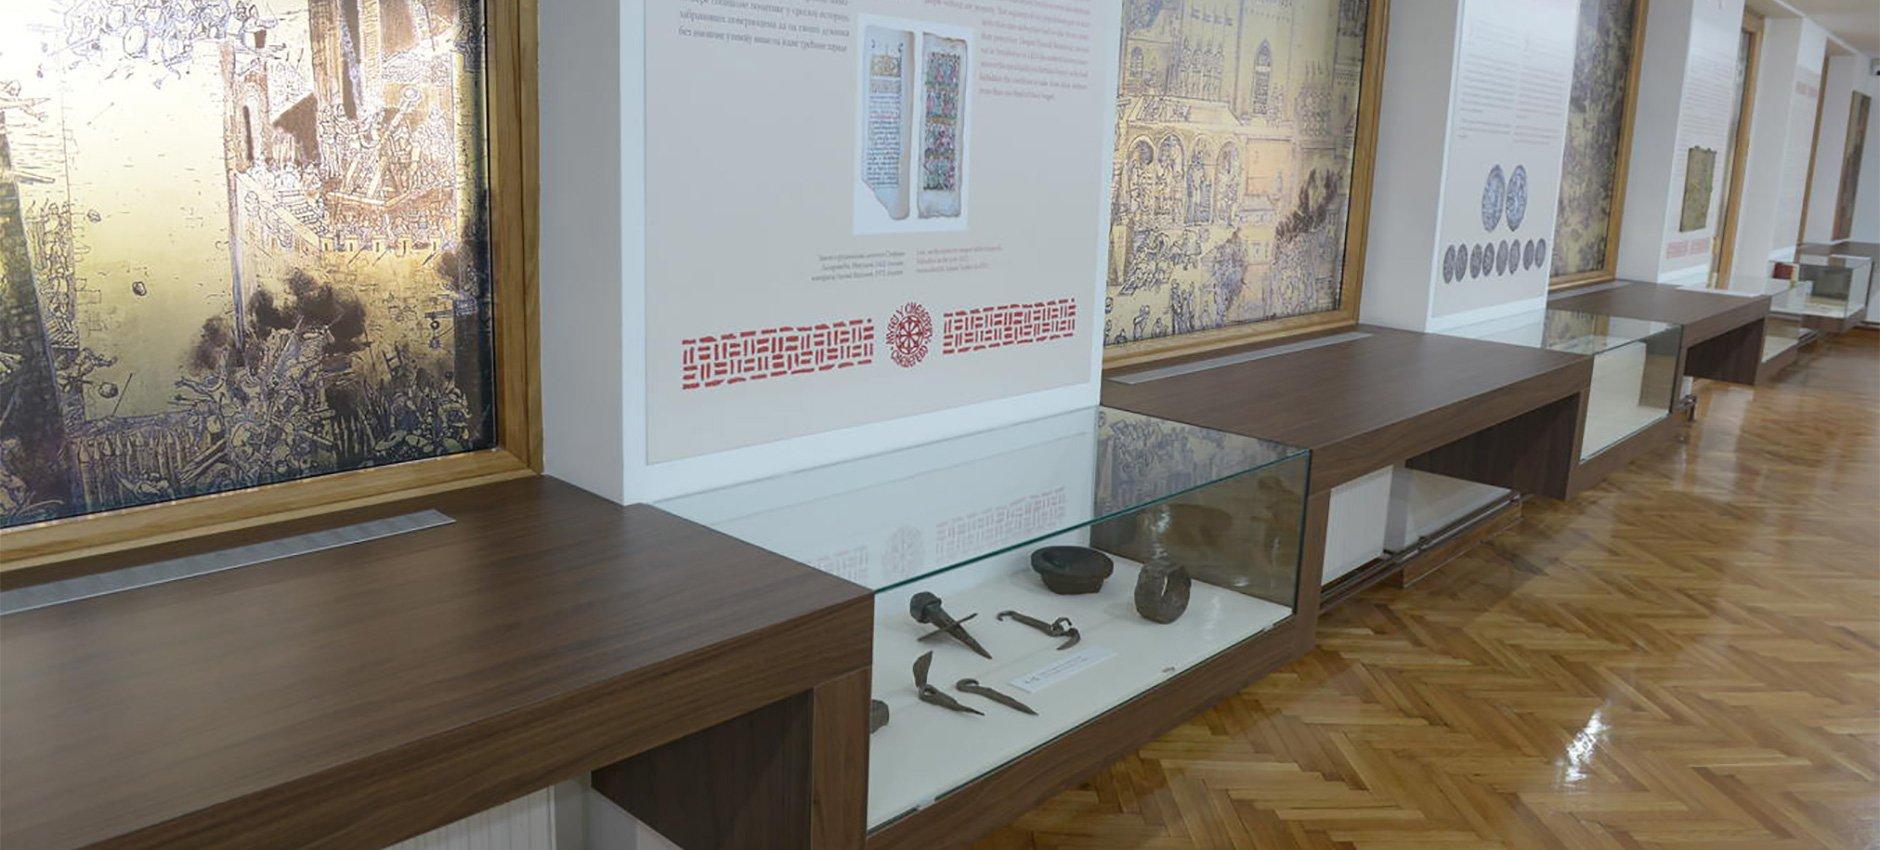 smederevo-muzej-3.jpg